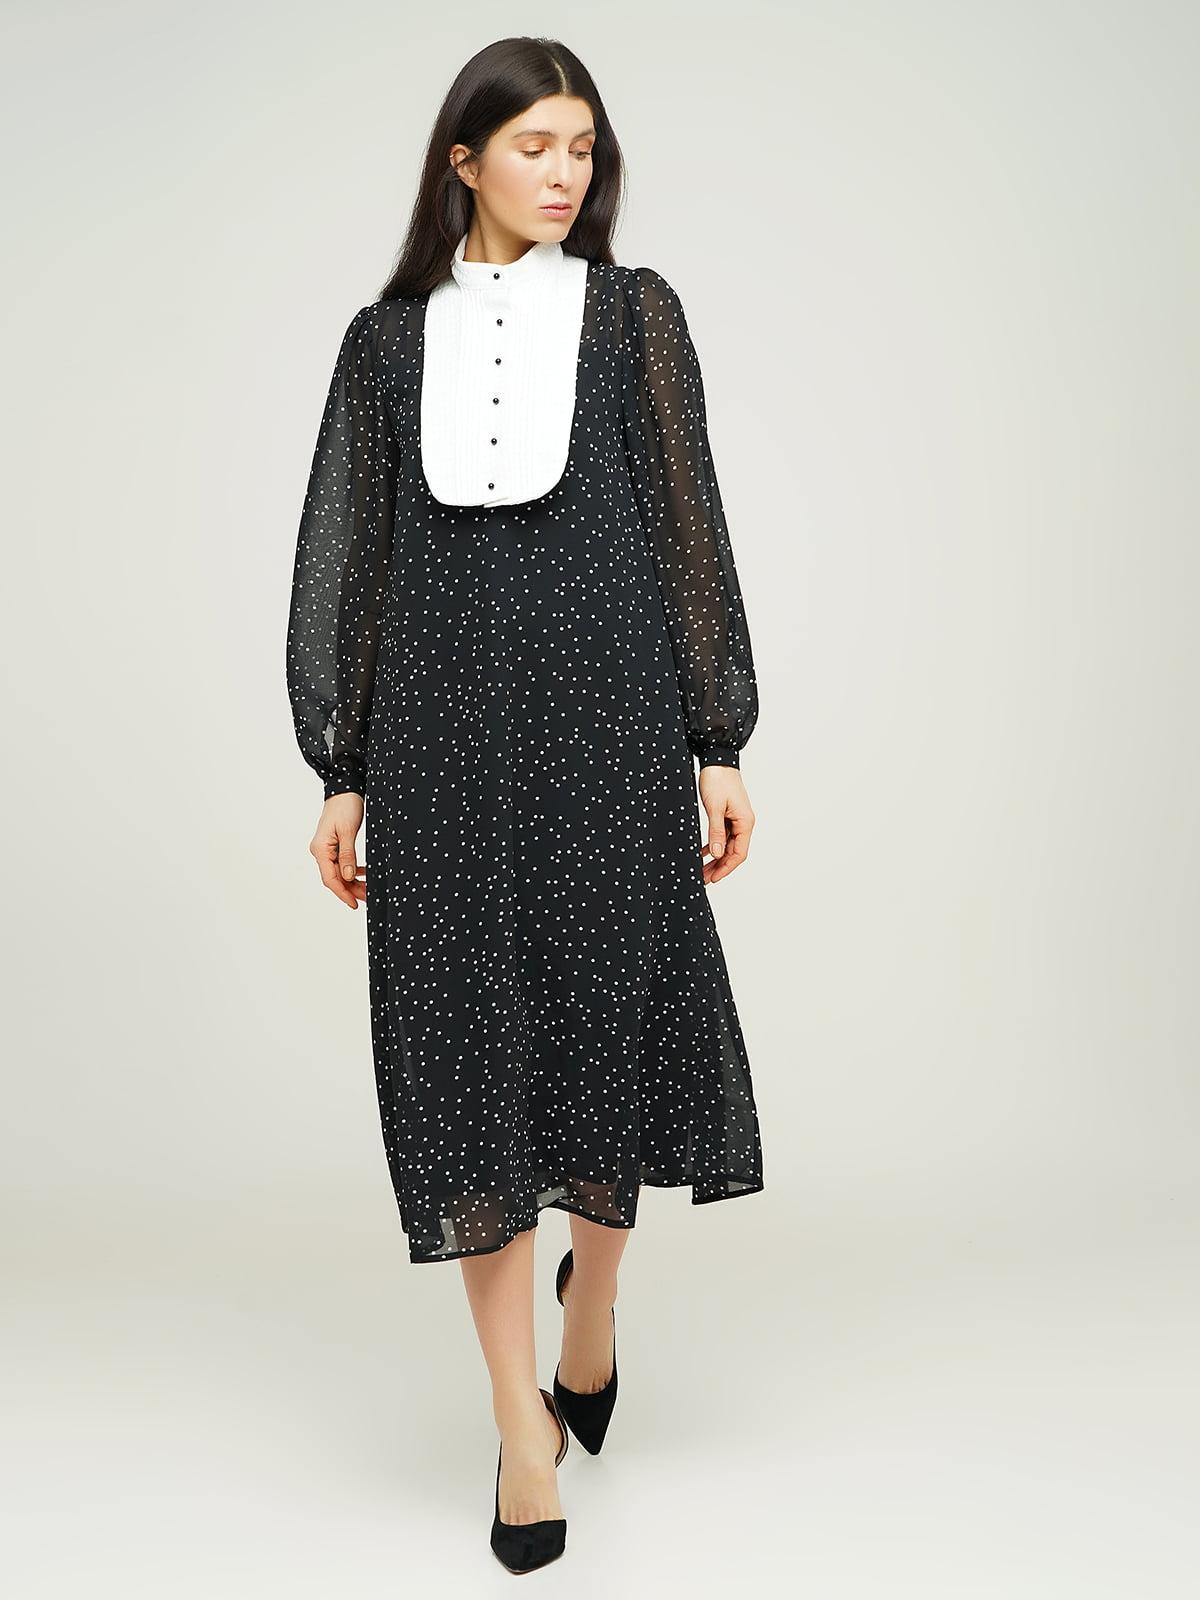 Сукня чорна у горошок | 5656183